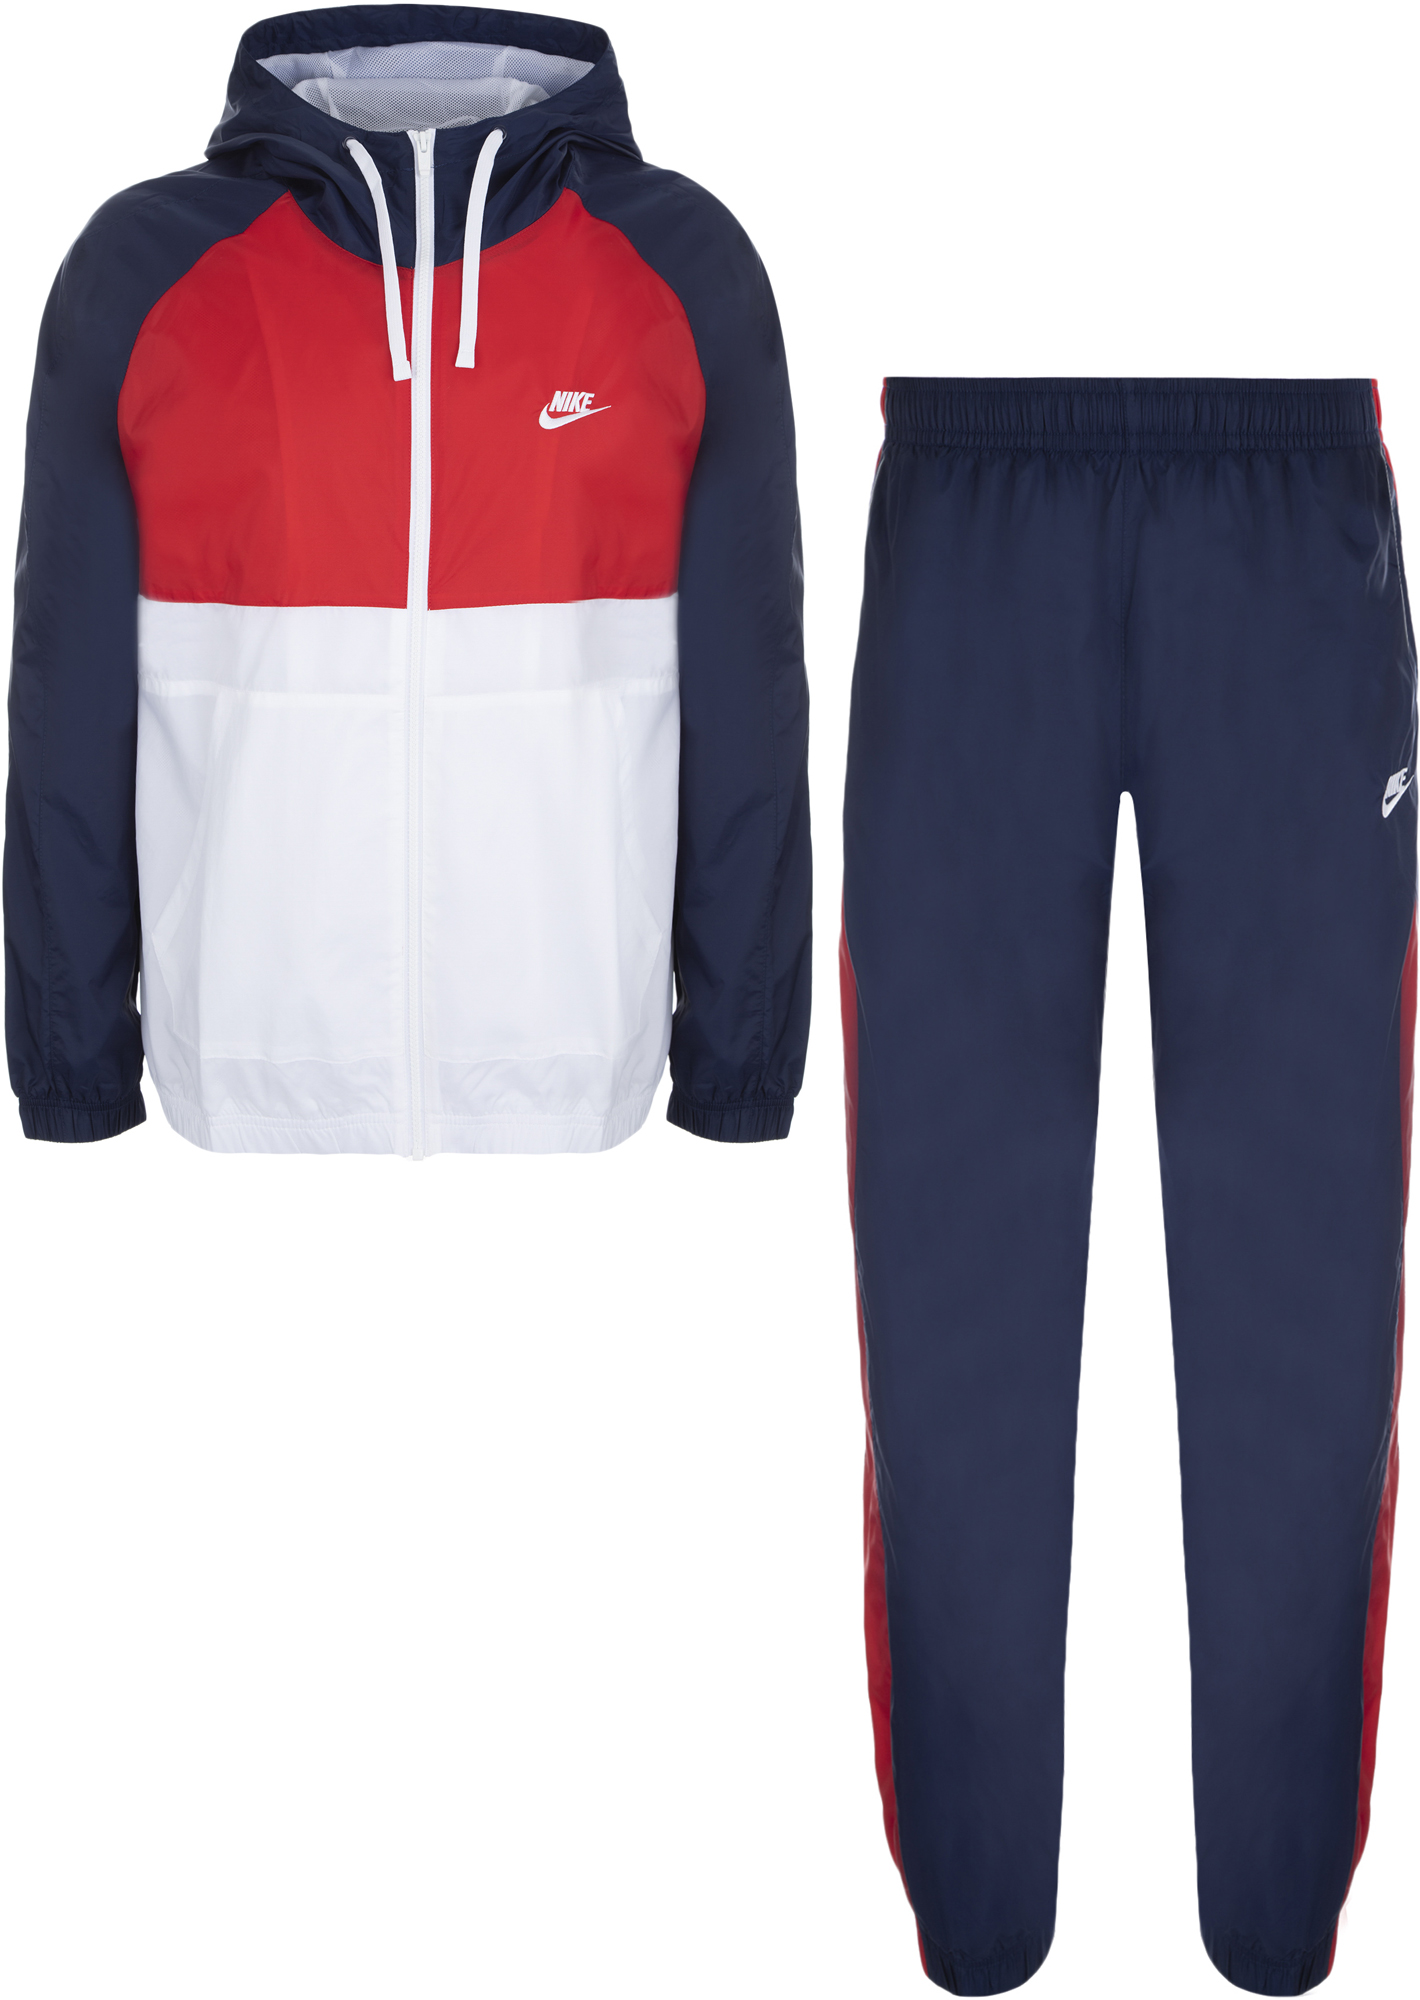 Фото Nike Спортивный костюм мужской Nike, размер 52-54